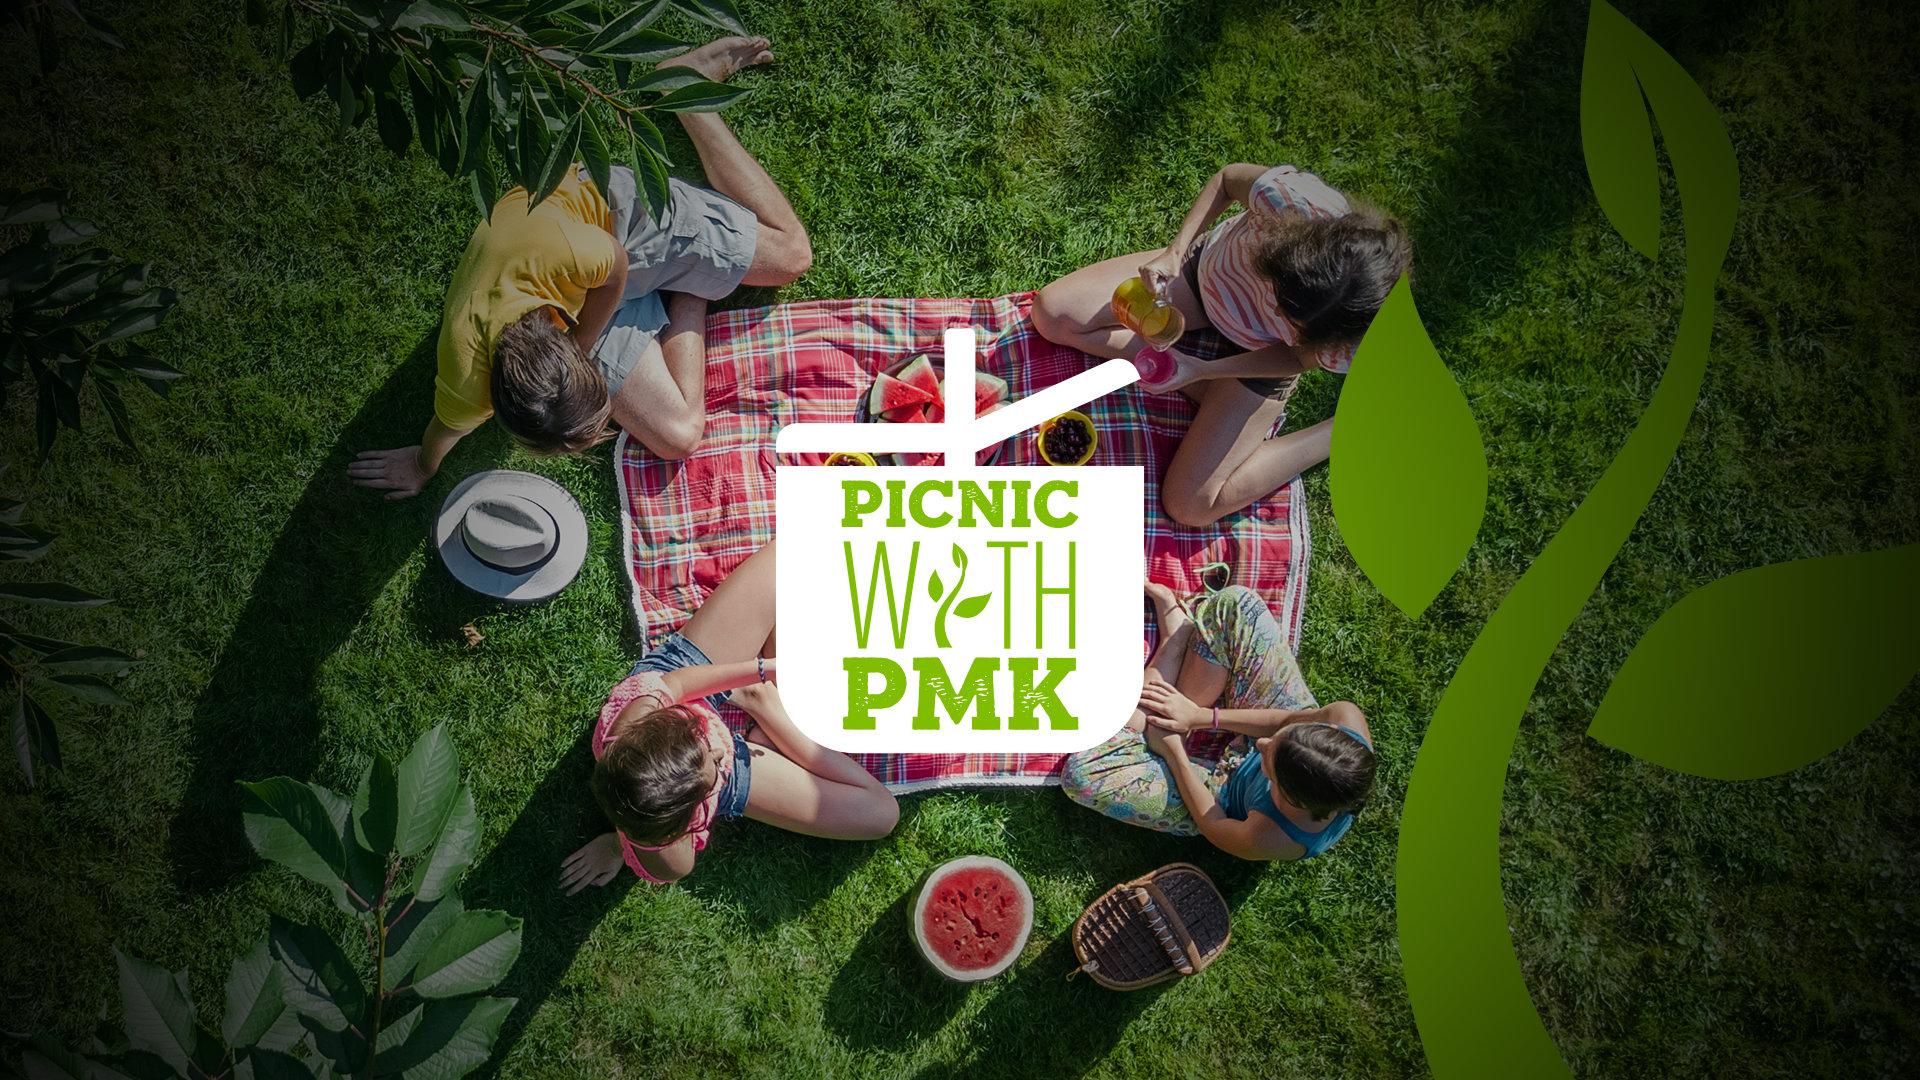 Picnic with PMK